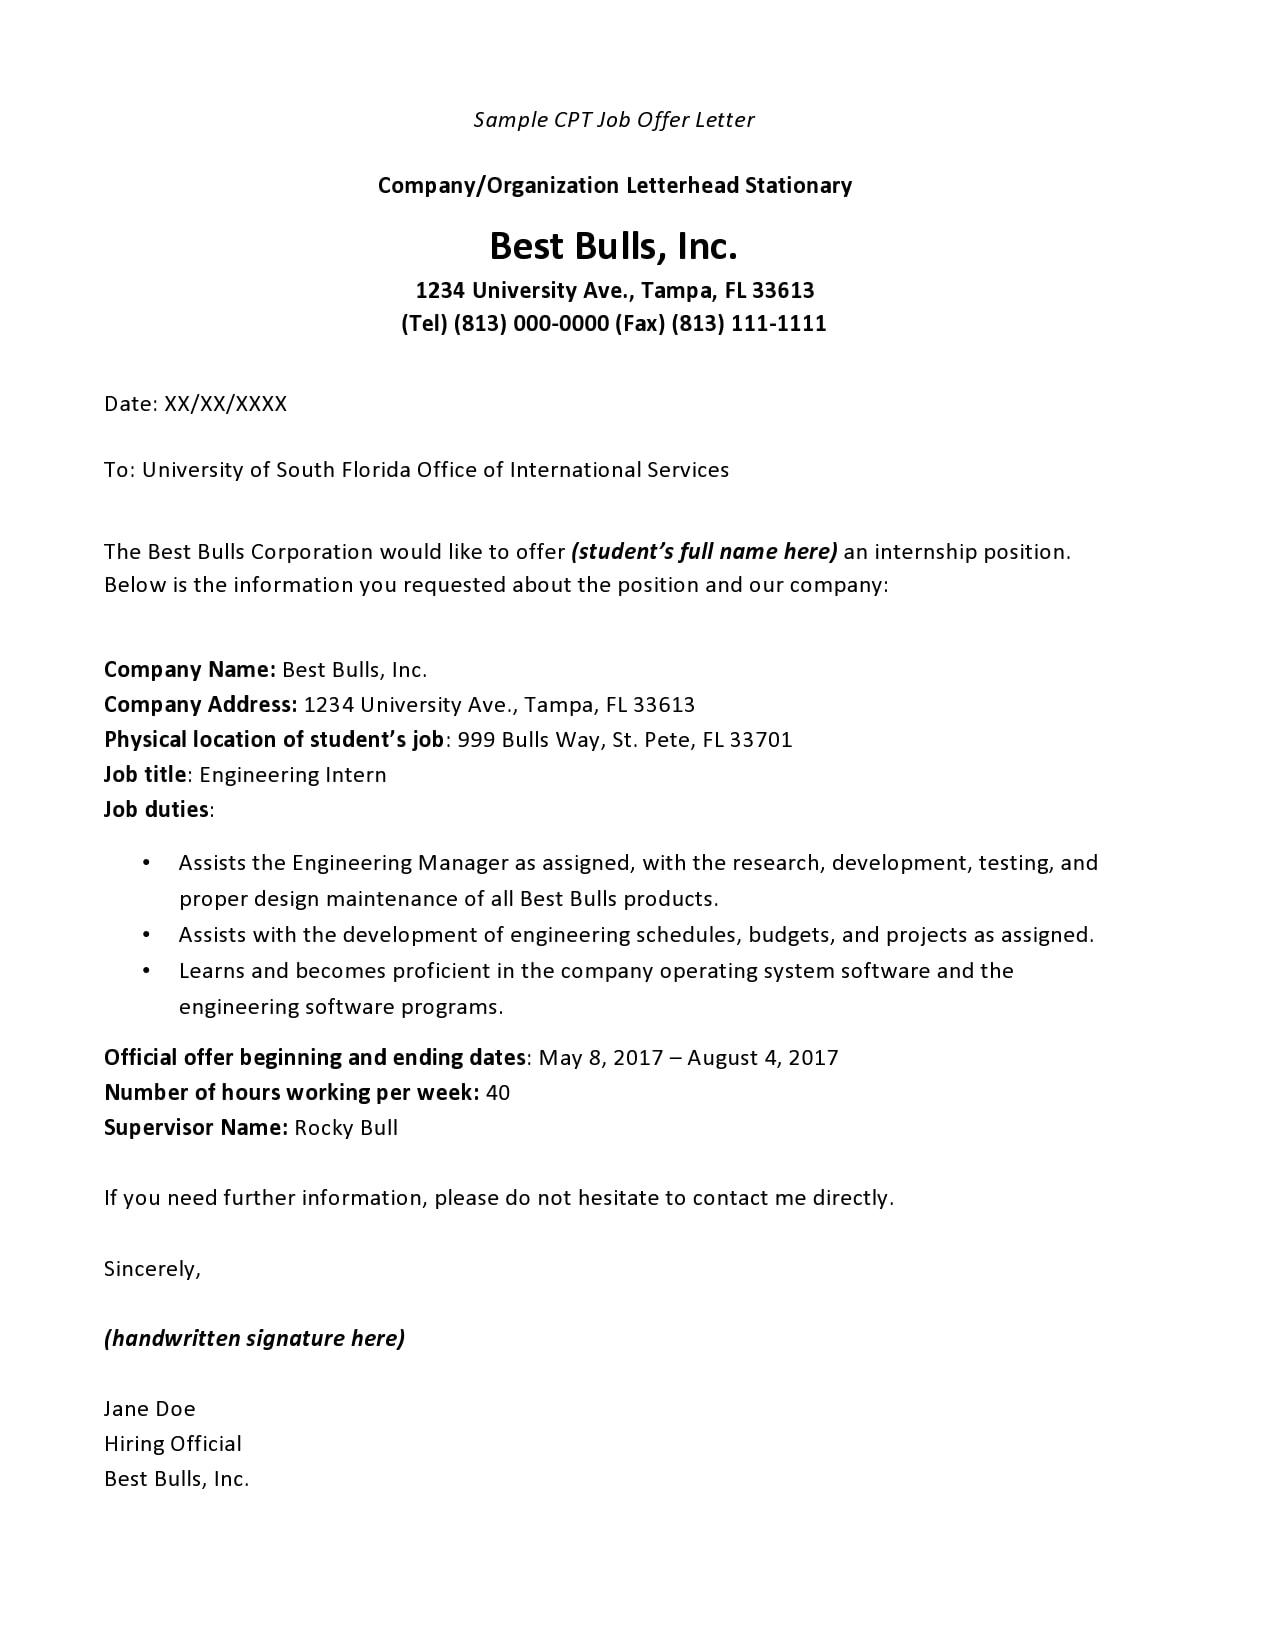 internship offer letter 15